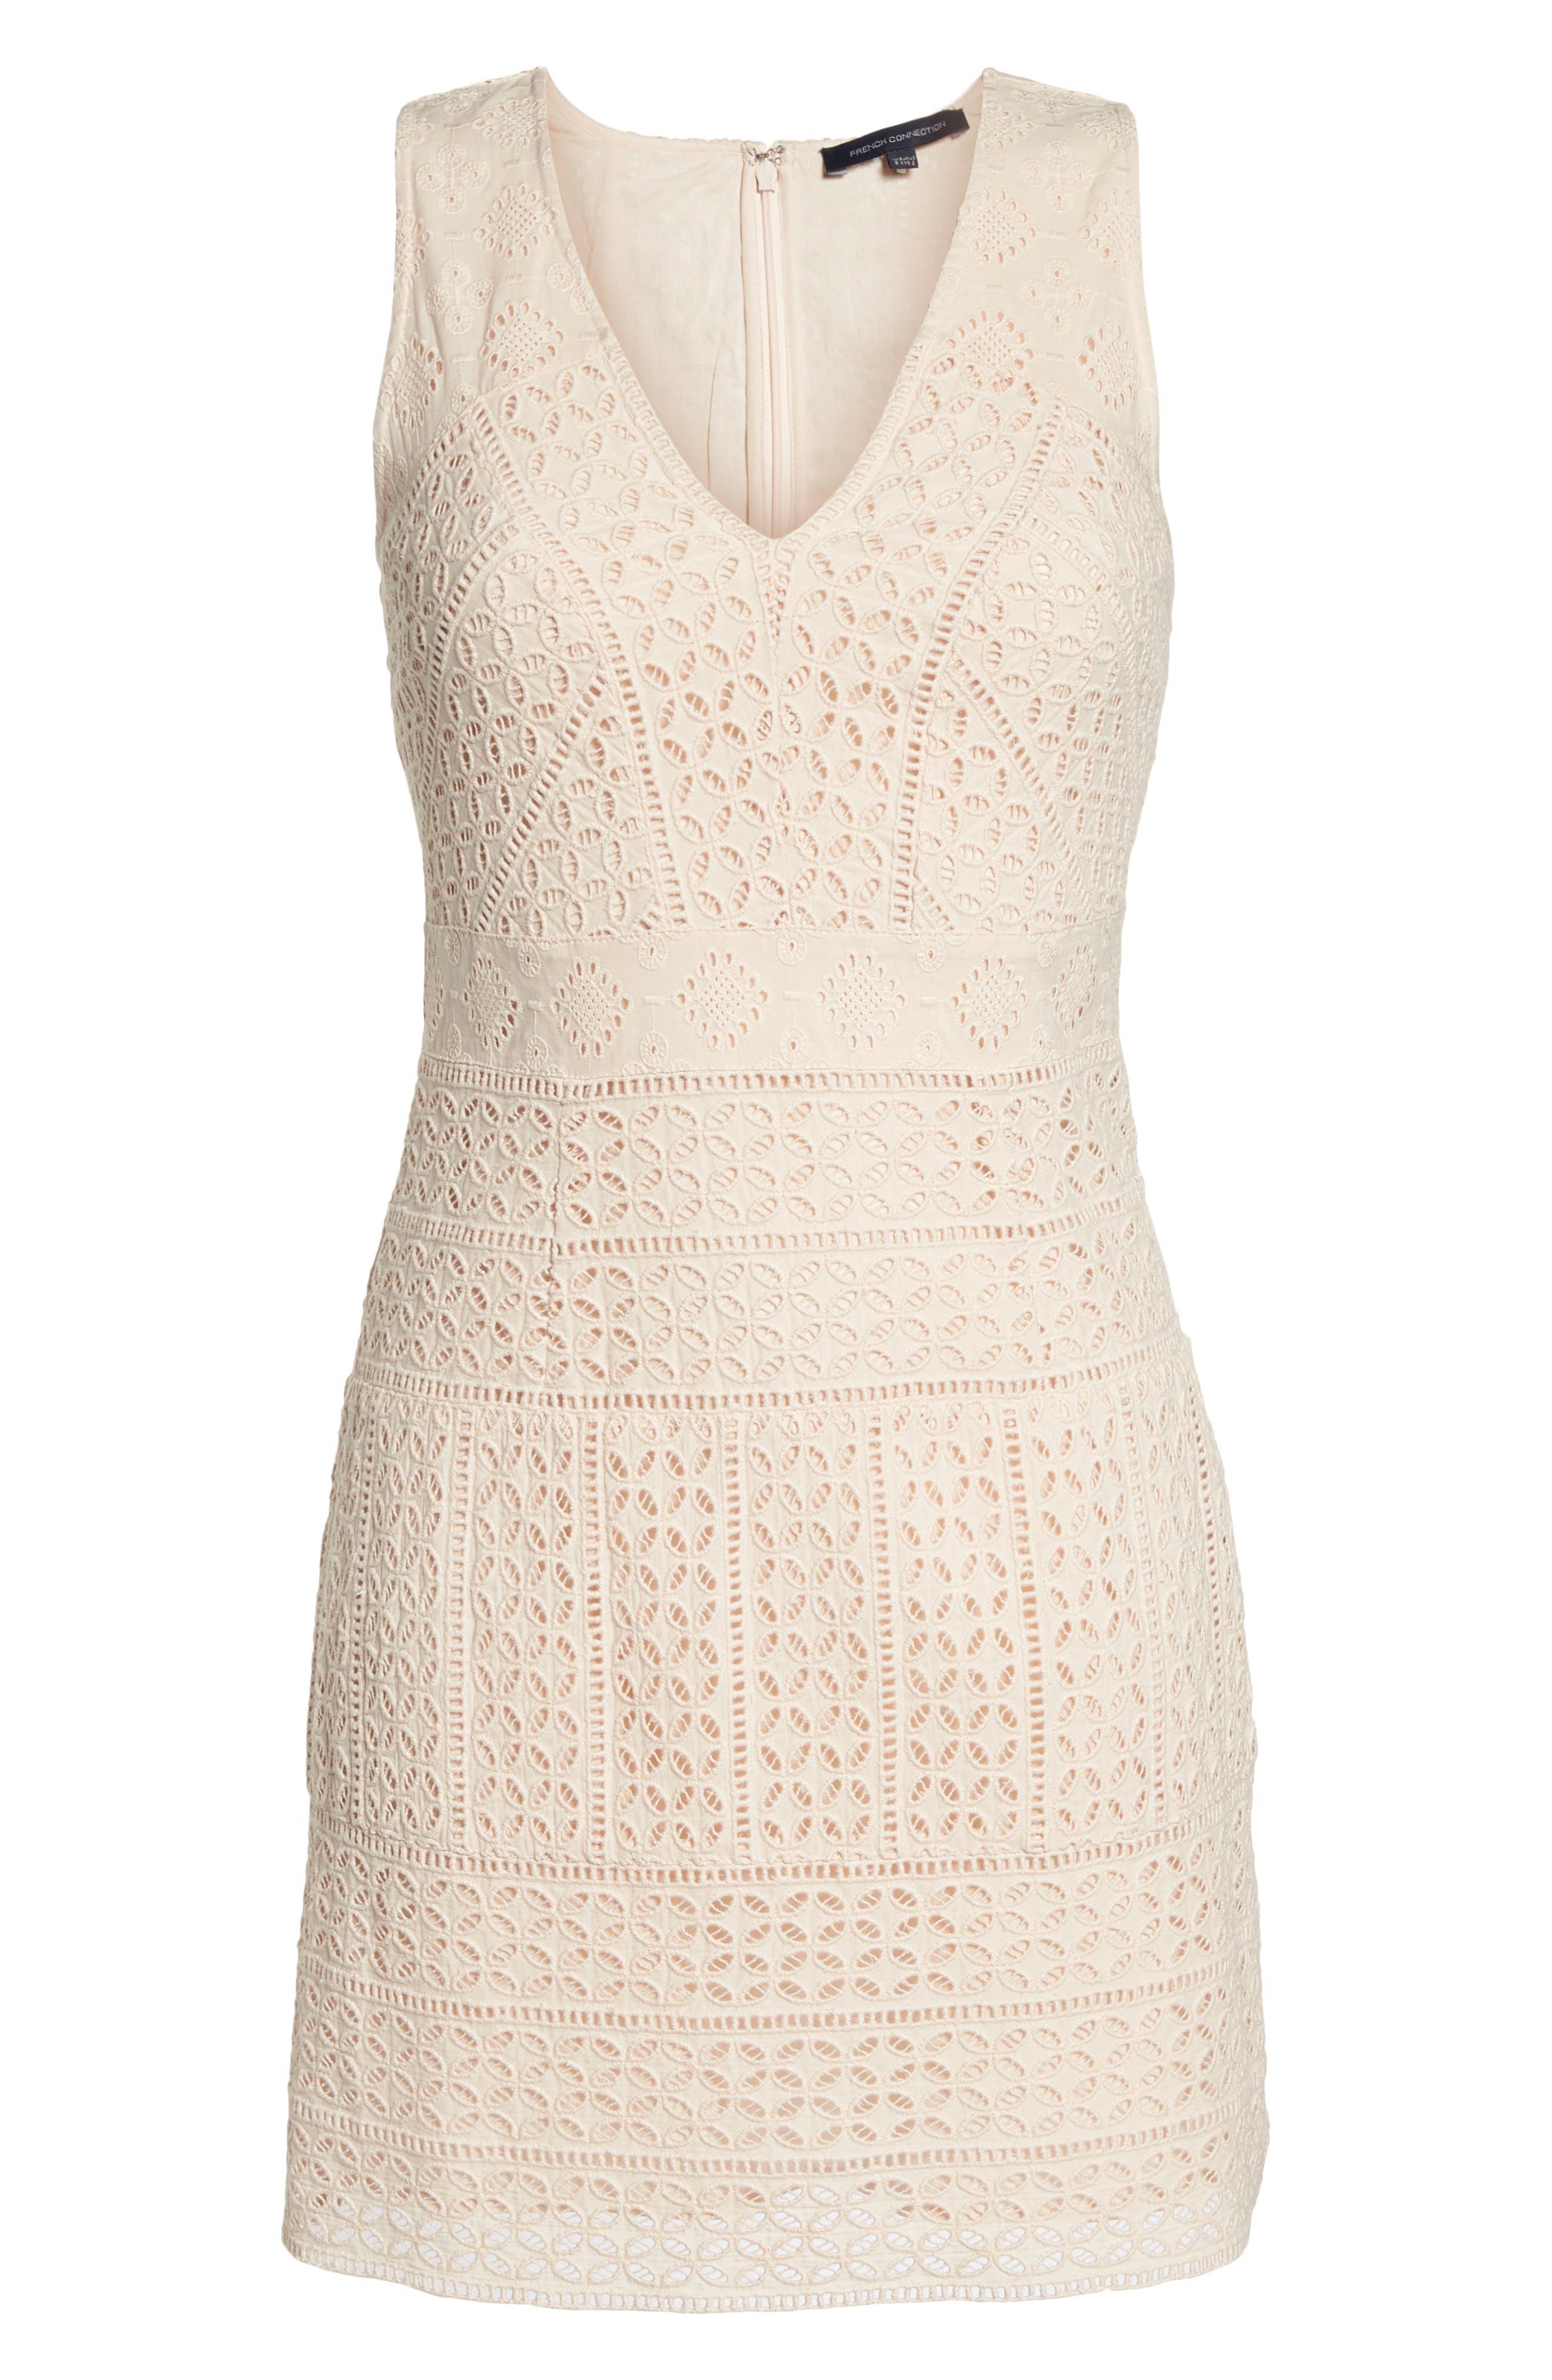 Schiffley Summer Cage Cotton Dress,                             Alternate thumbnail 7, color,                             687